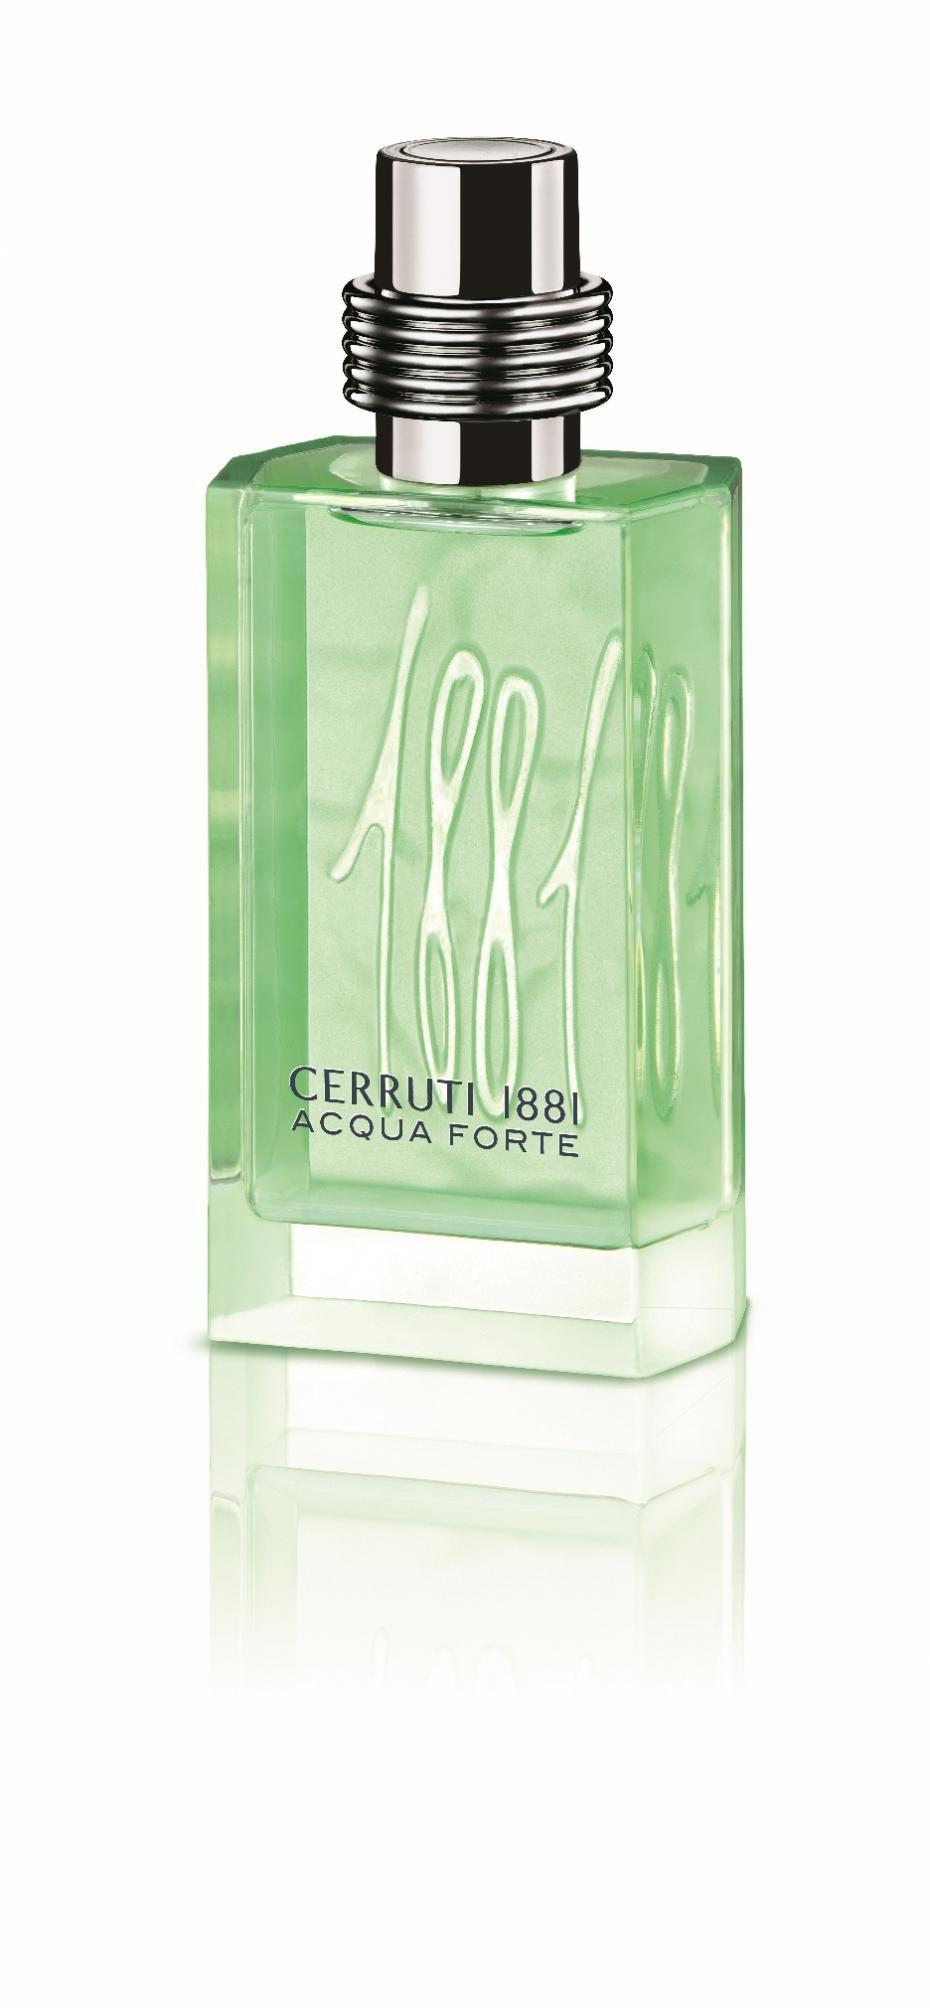 Cerruti 1881 Acqua Forte аромат для мужчин